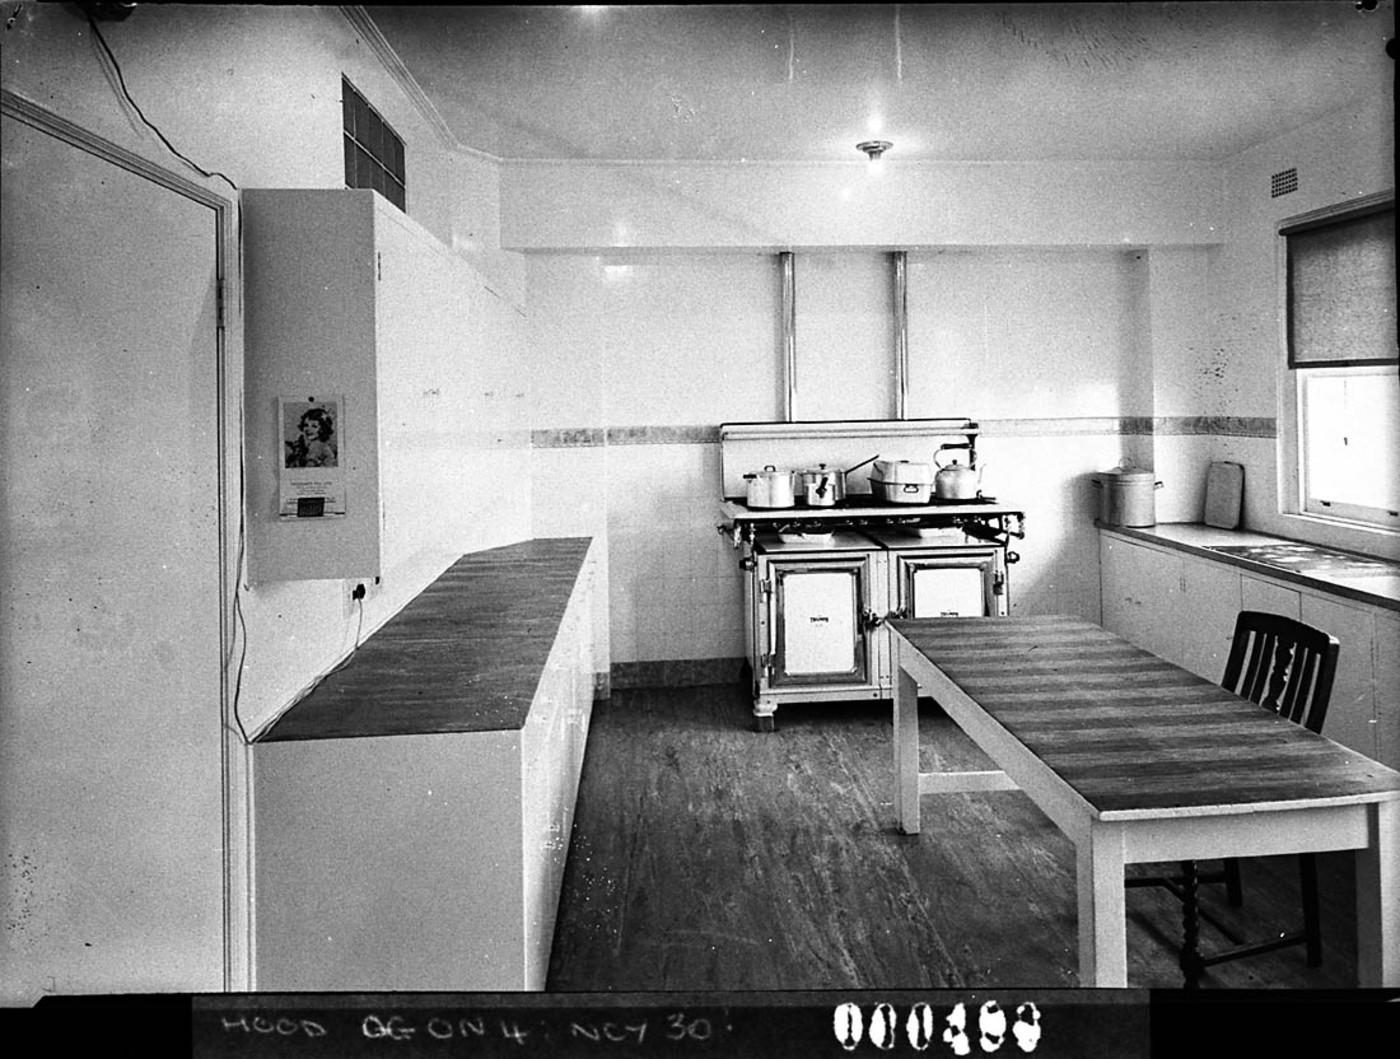 File:SLNSW 12234 Typical kitchen Macleay Regis flats taken for Mr ...